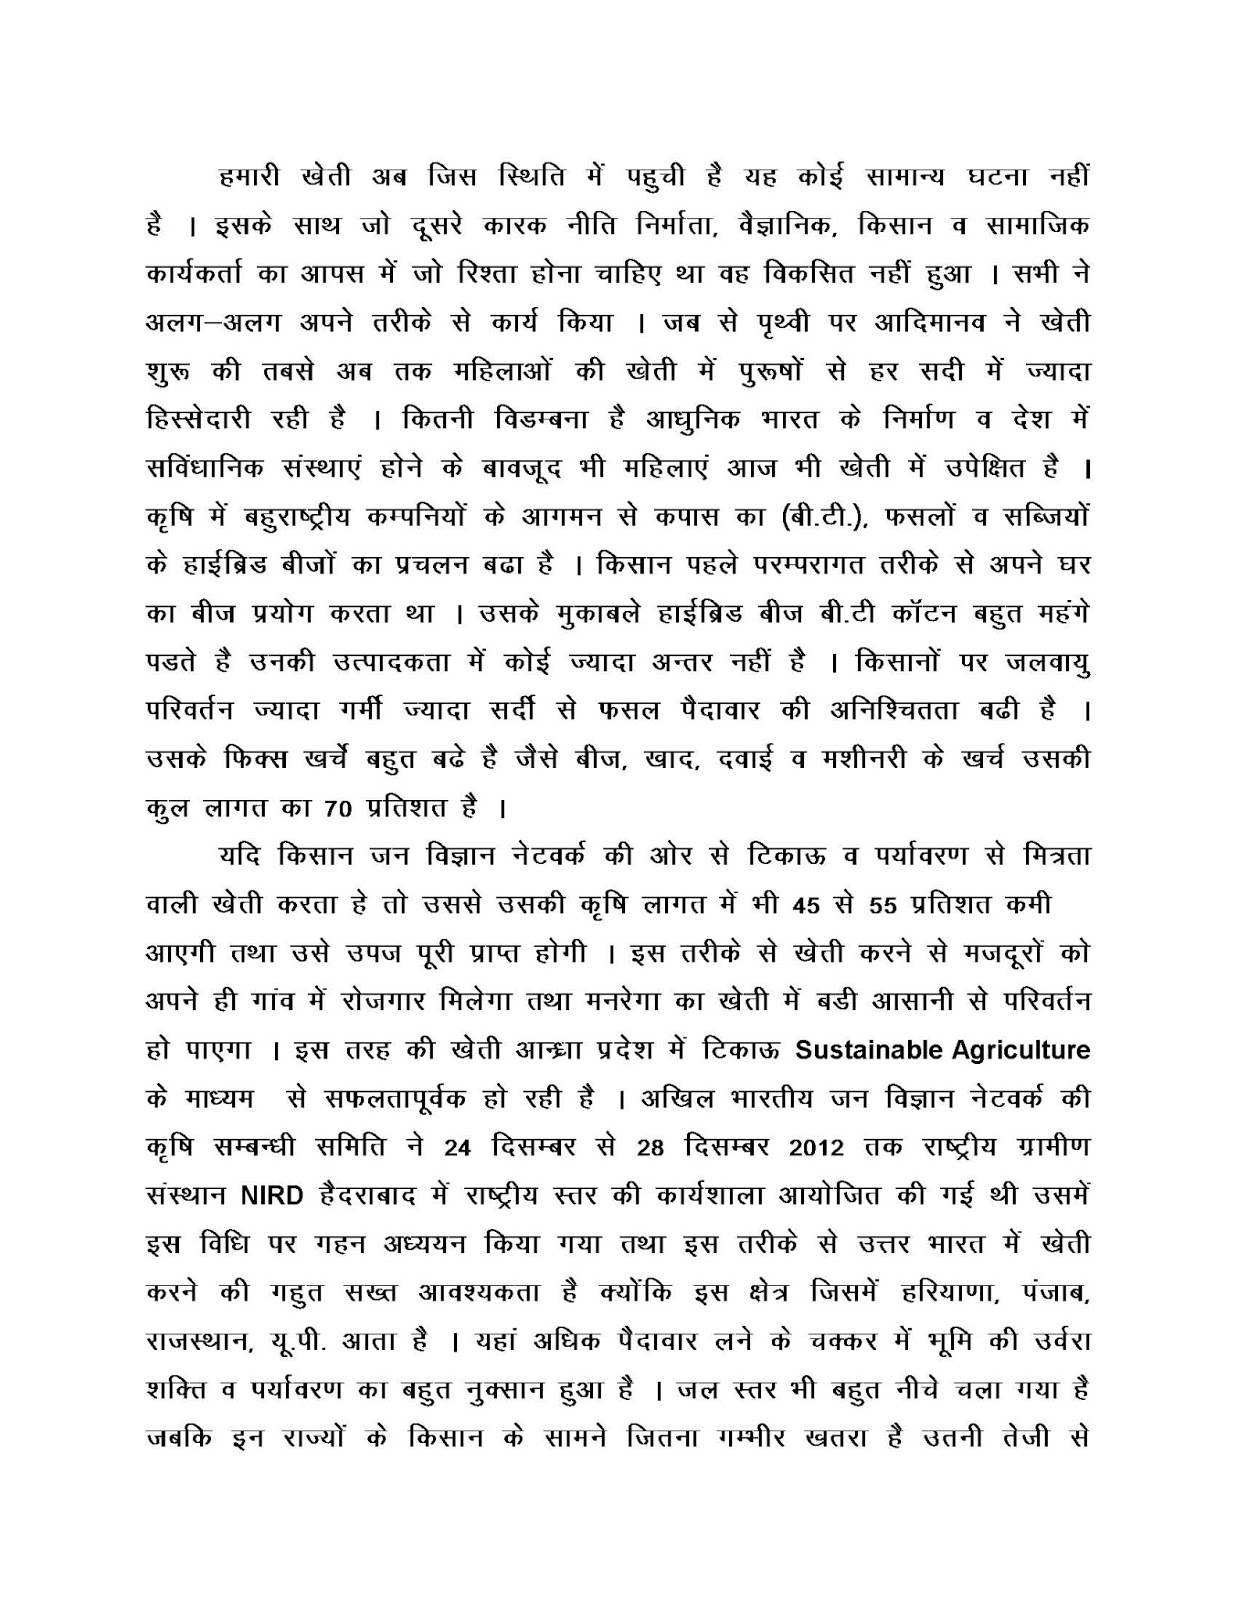 008 Gender Equality Essay Example Hindiworkdr Rajindersingh Page 3 Top Research Paper Ideas Argumentative Pdf In Simple Words Full